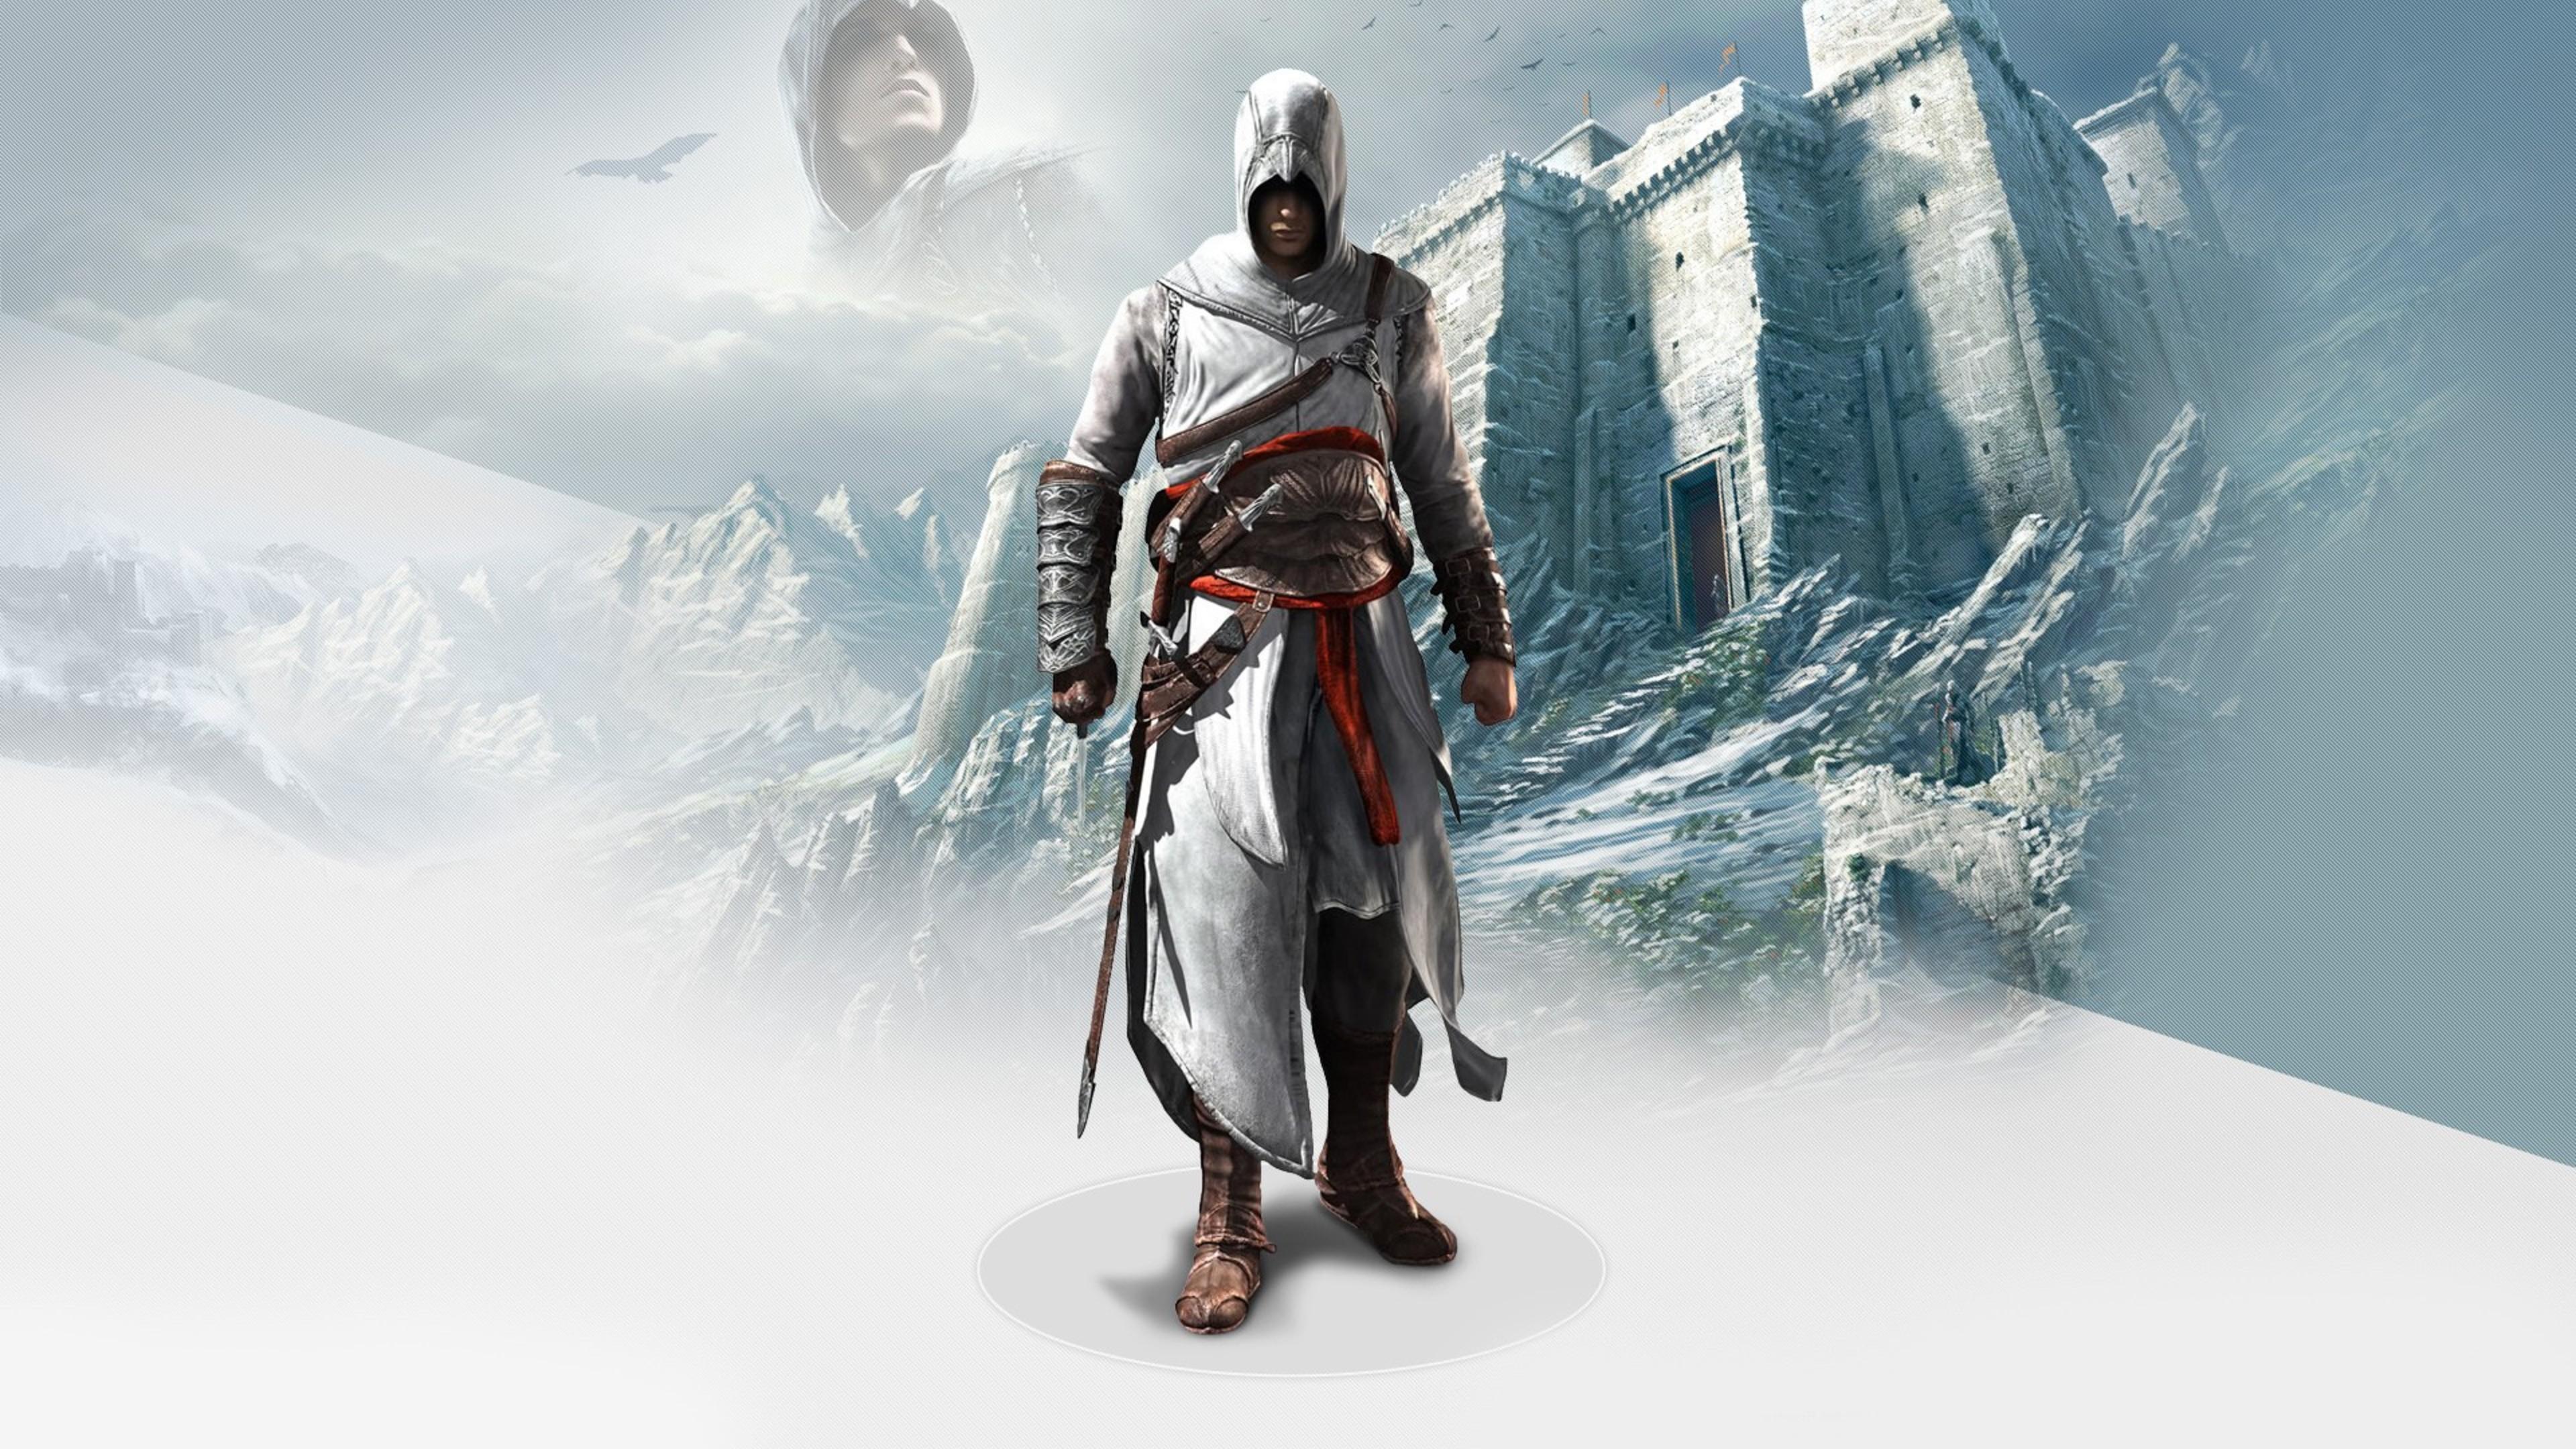 Wallpaper 4k Altair In Assassins Creed 2 4k Assassins Creed